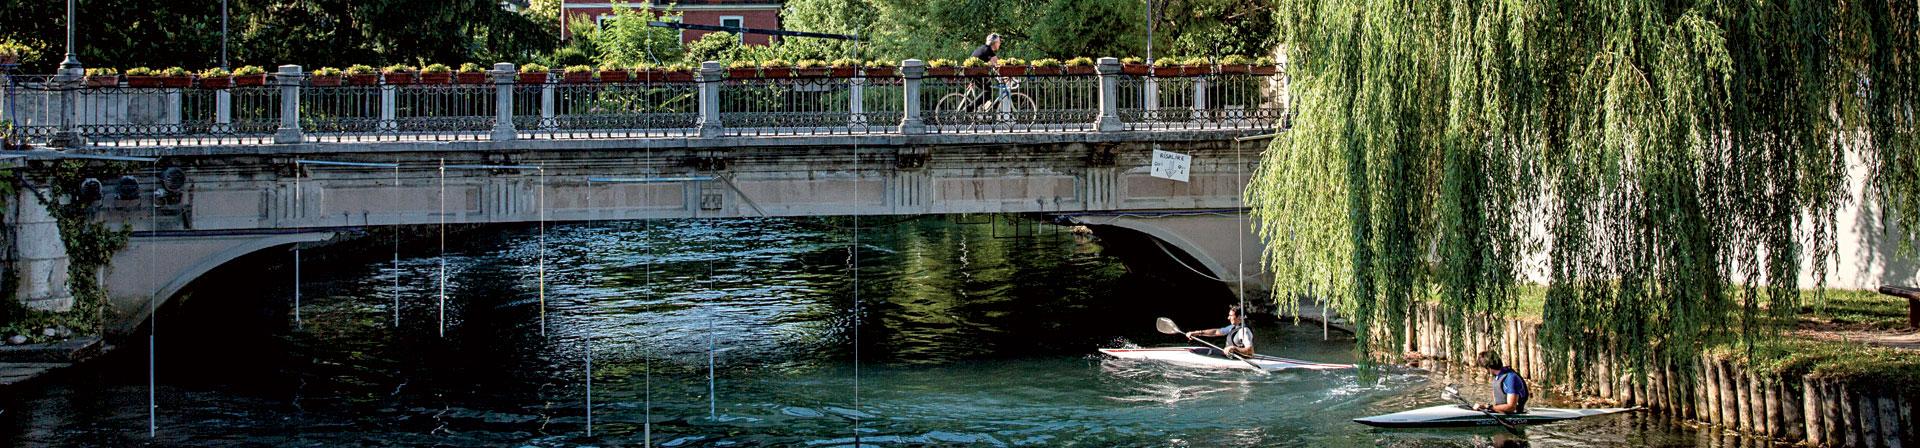 Fiume Livenza: itinerari in canoa - Visit Sacile